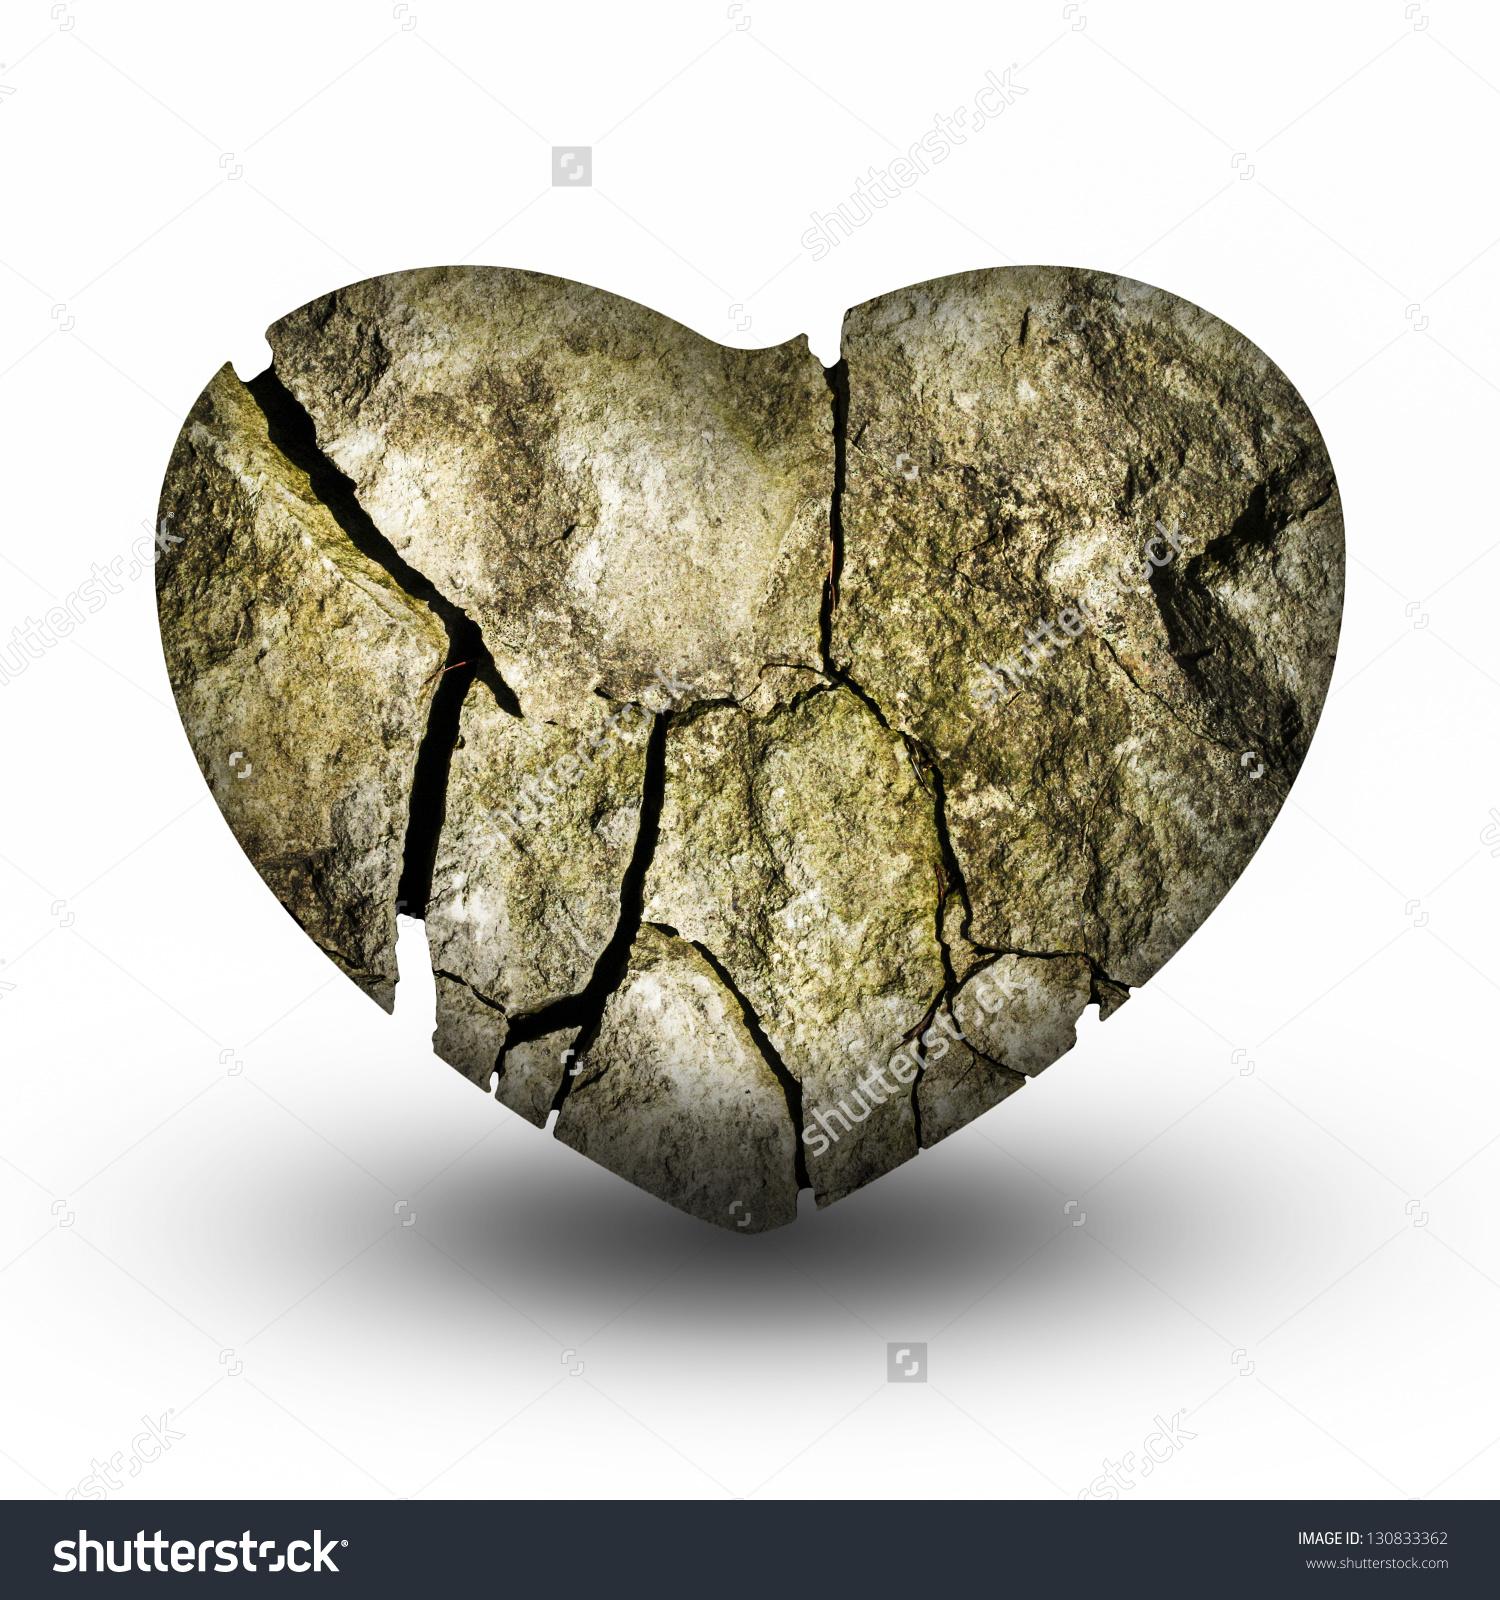 Heart stone clipart.